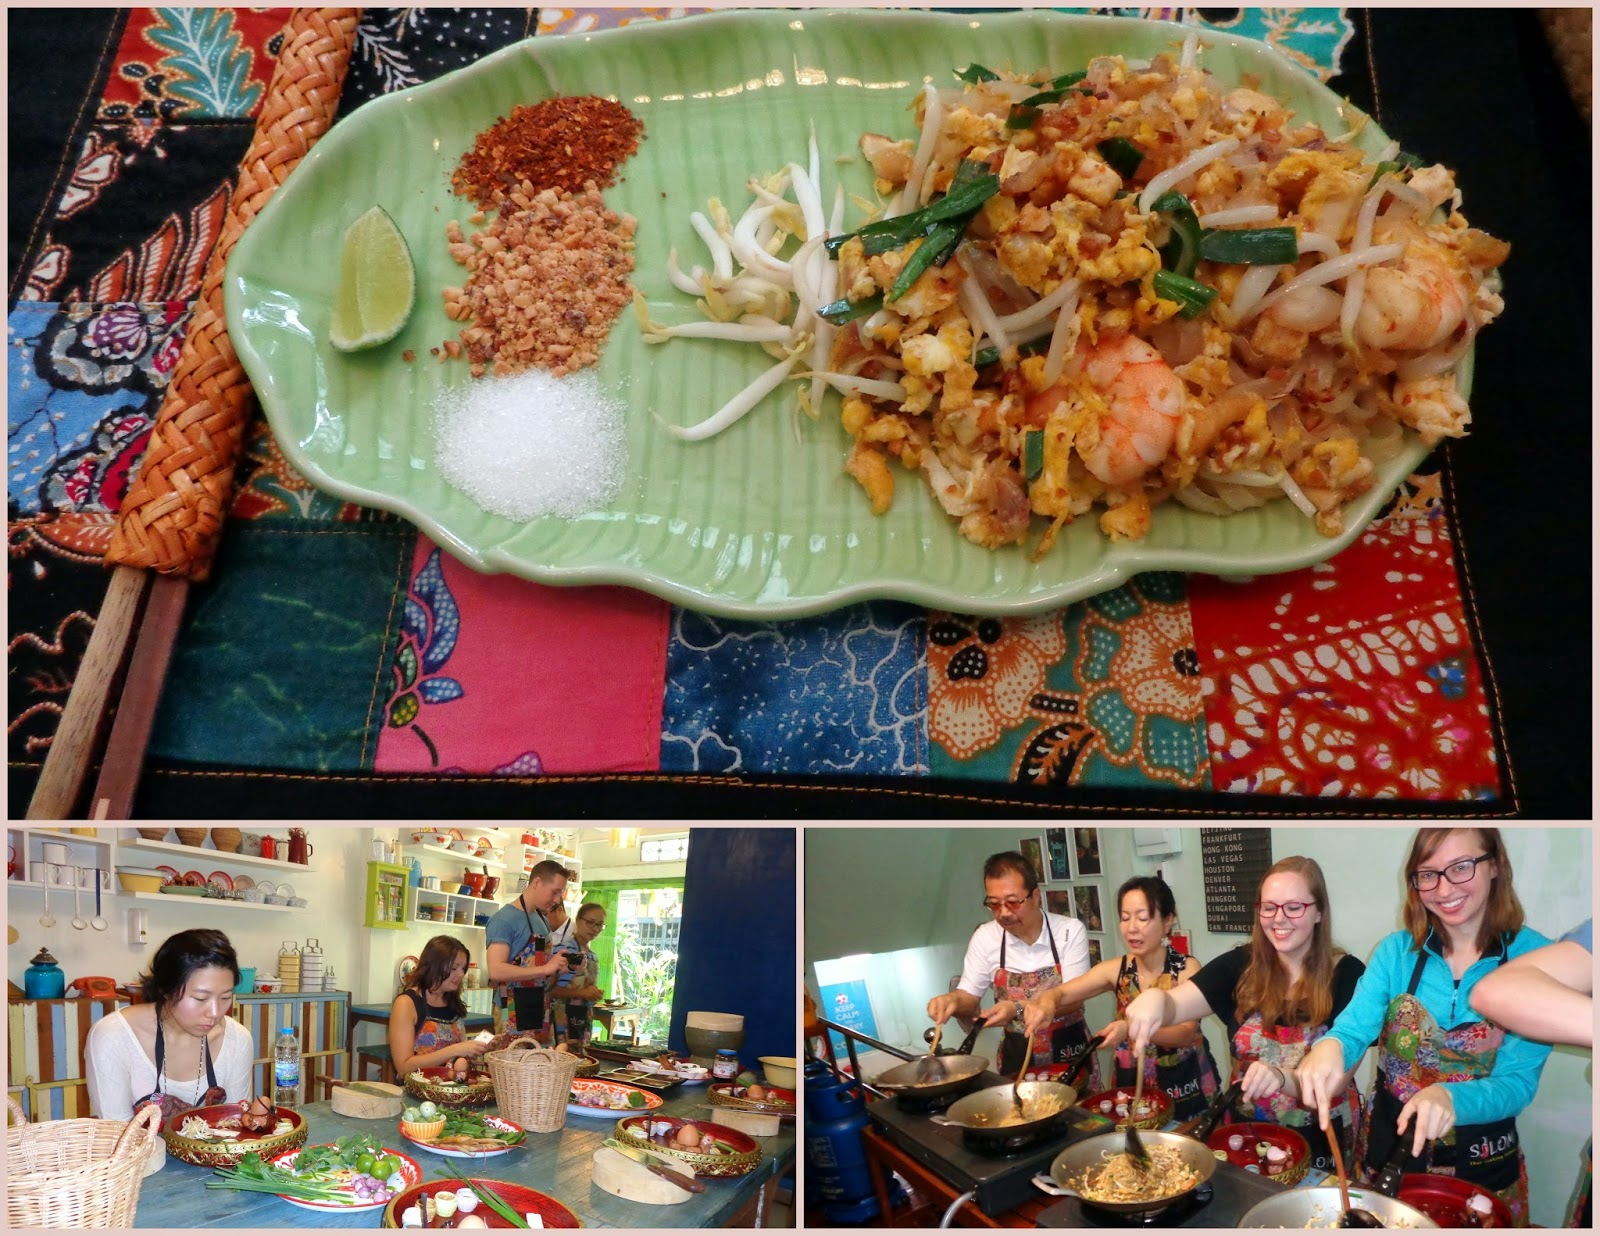 Pad Thai at Silom Thai Cooking School in Bangkok